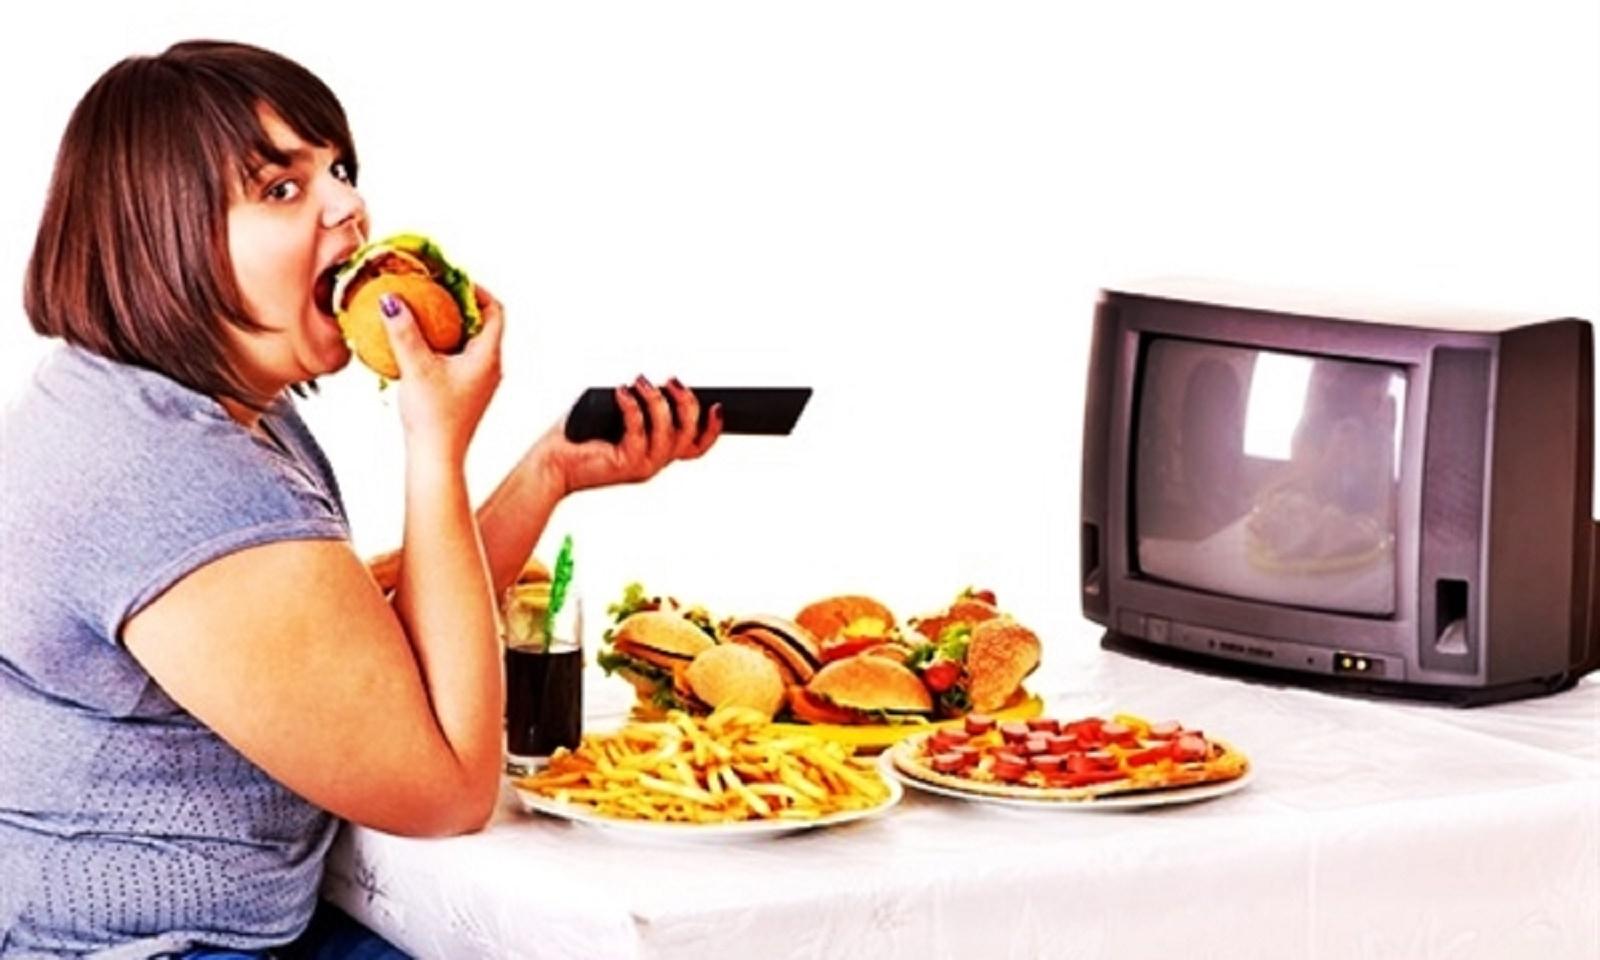 obezite nedir , obezite tedavisi nasıldır